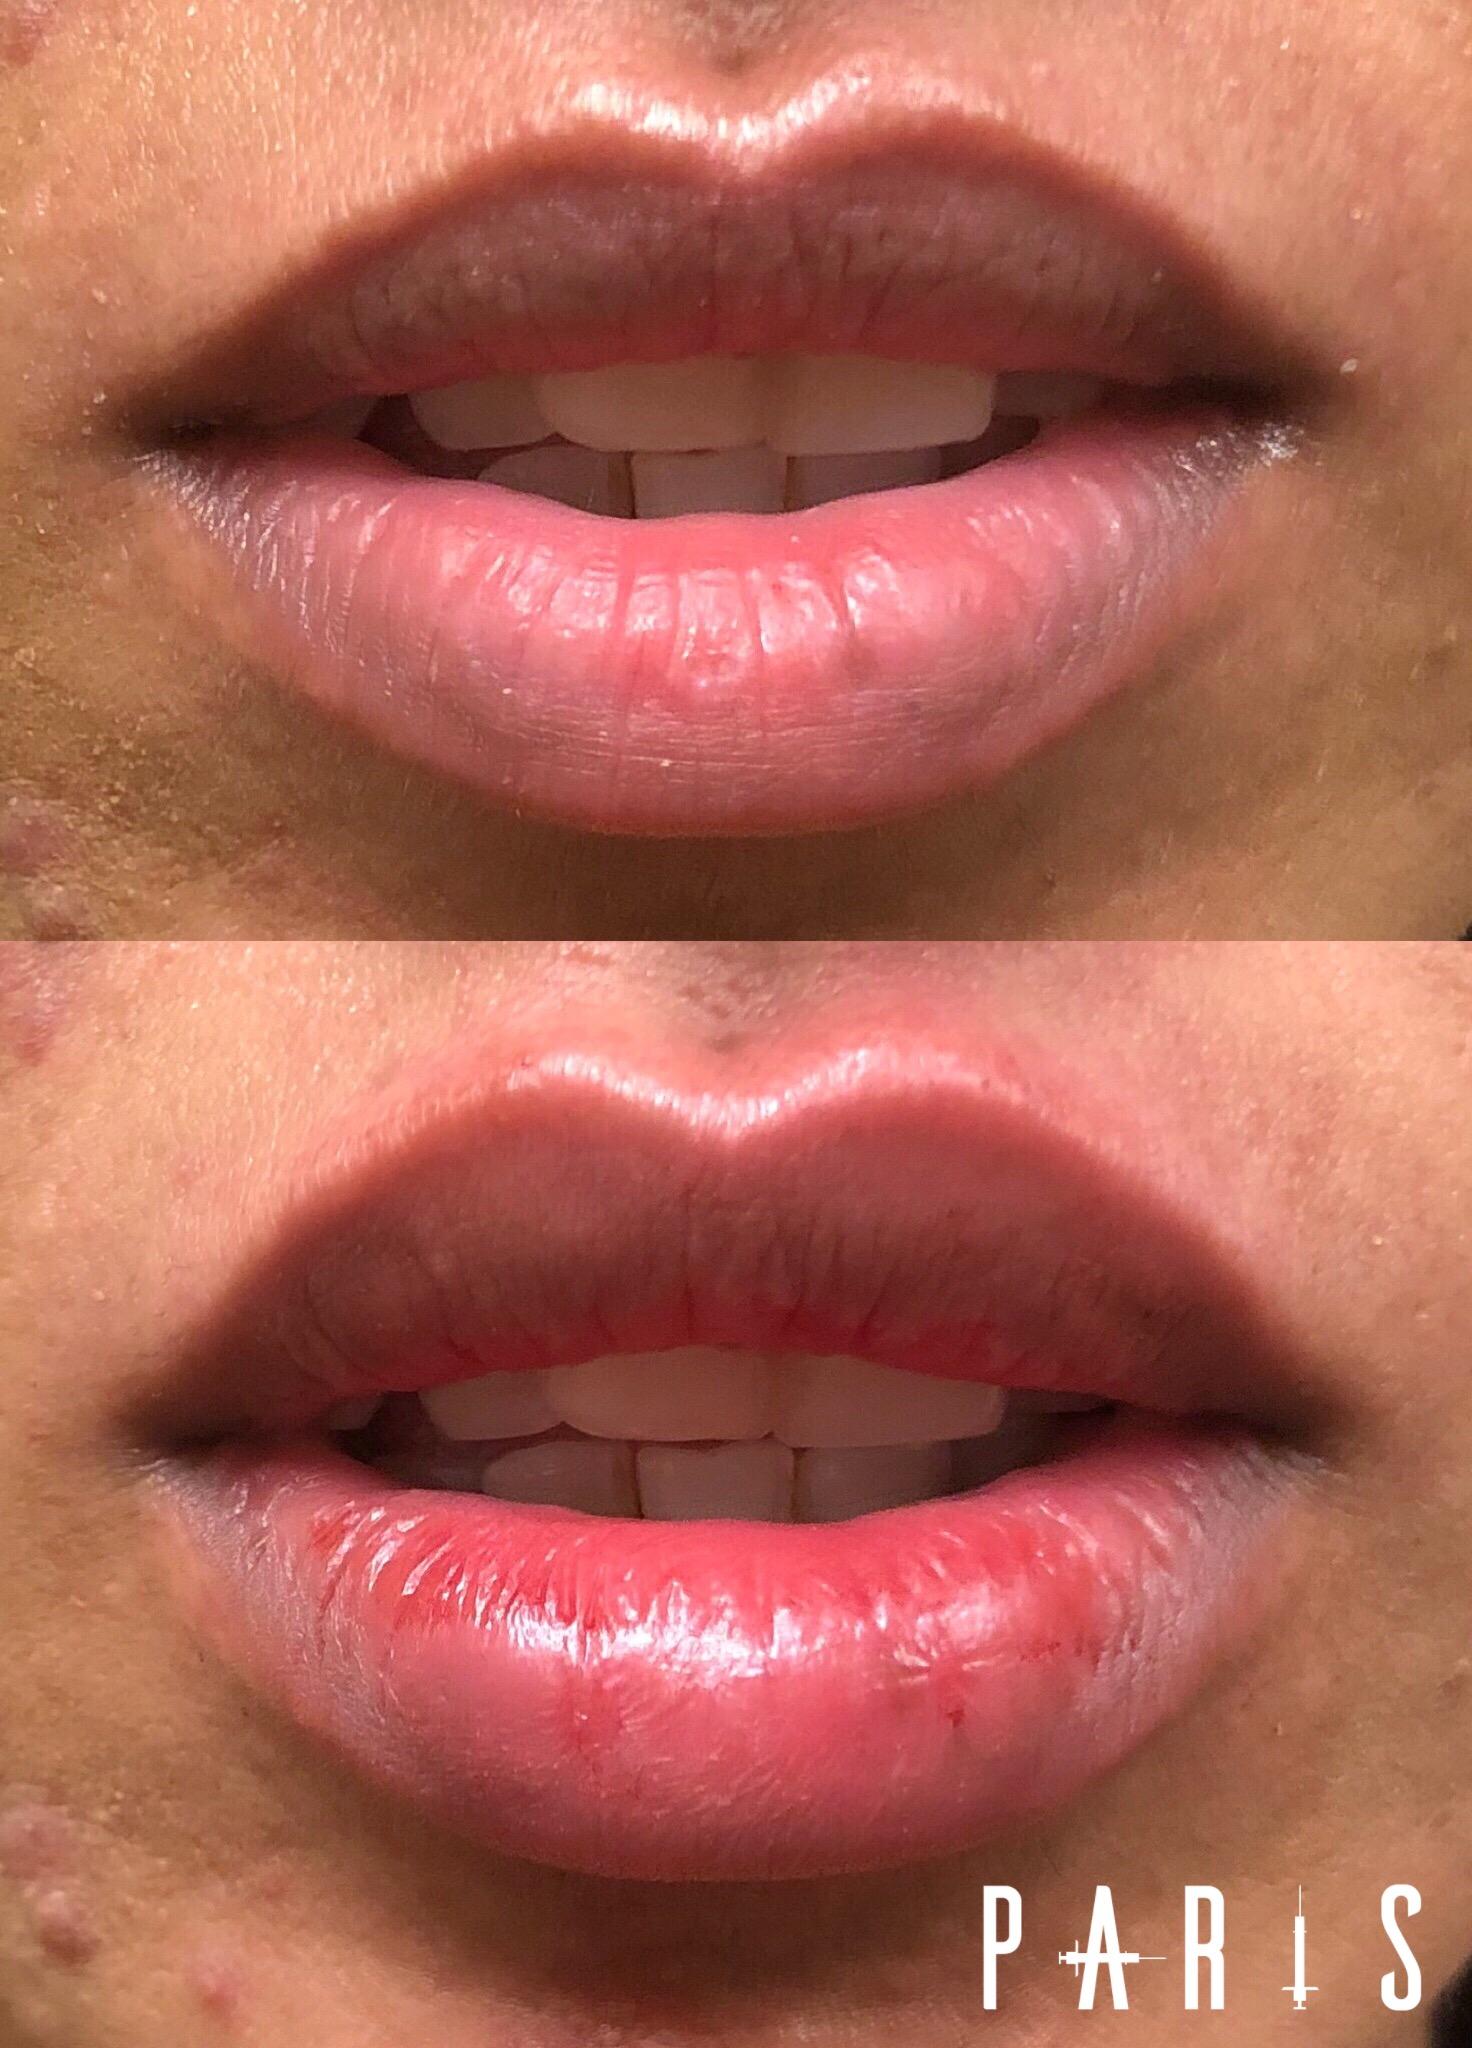 ParisPlump.Lips.Filler.Scottsdale.AZ.Beforeandafter.ParisInjectables.25